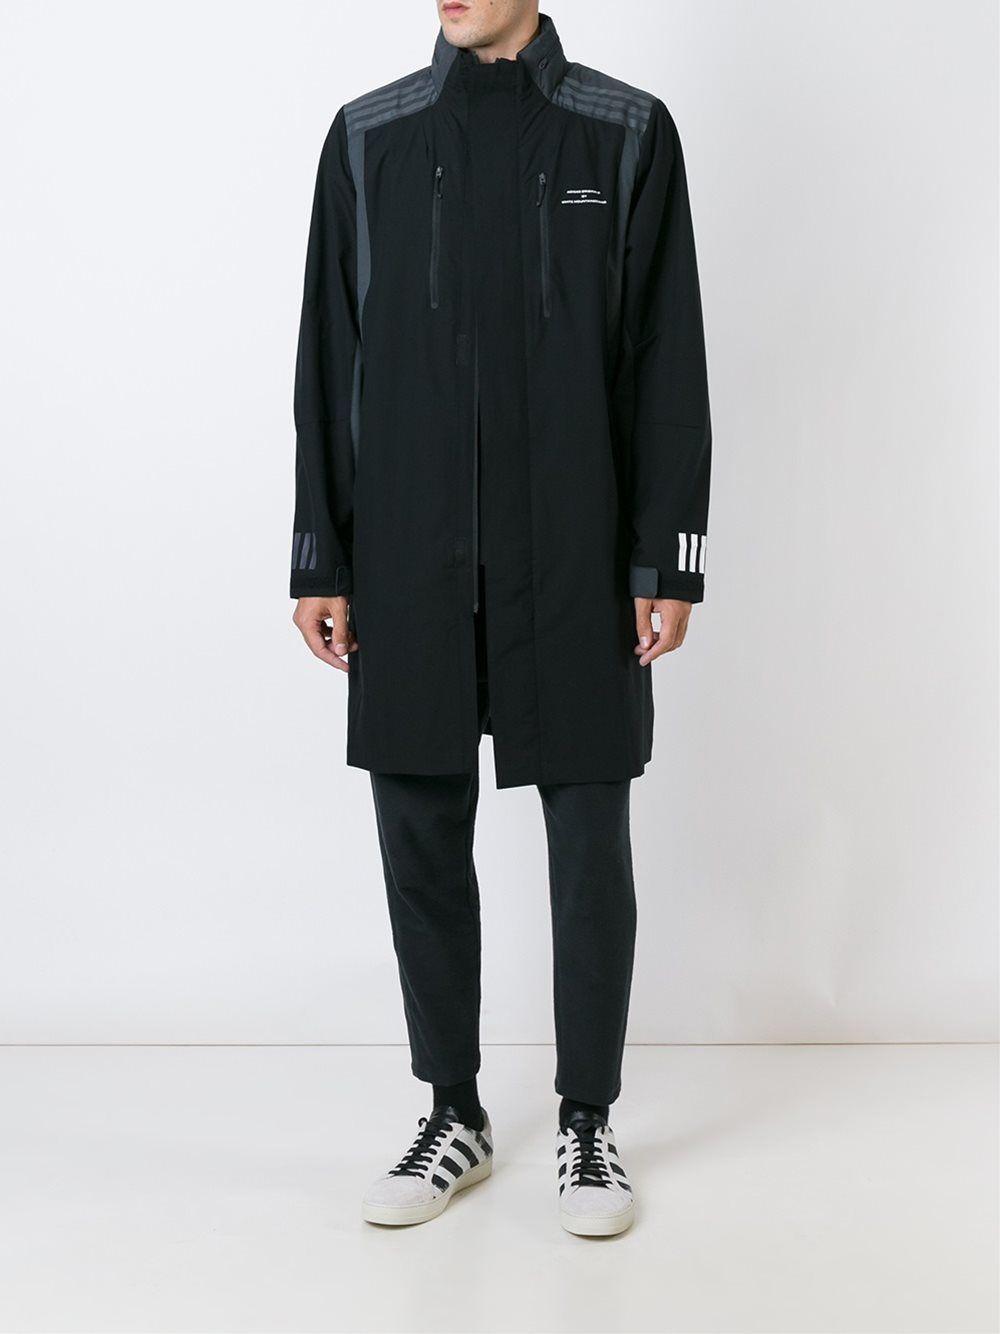 6c5cbe220 Adidas x White Mountaineering long coat   Future/Tech Clothing ...